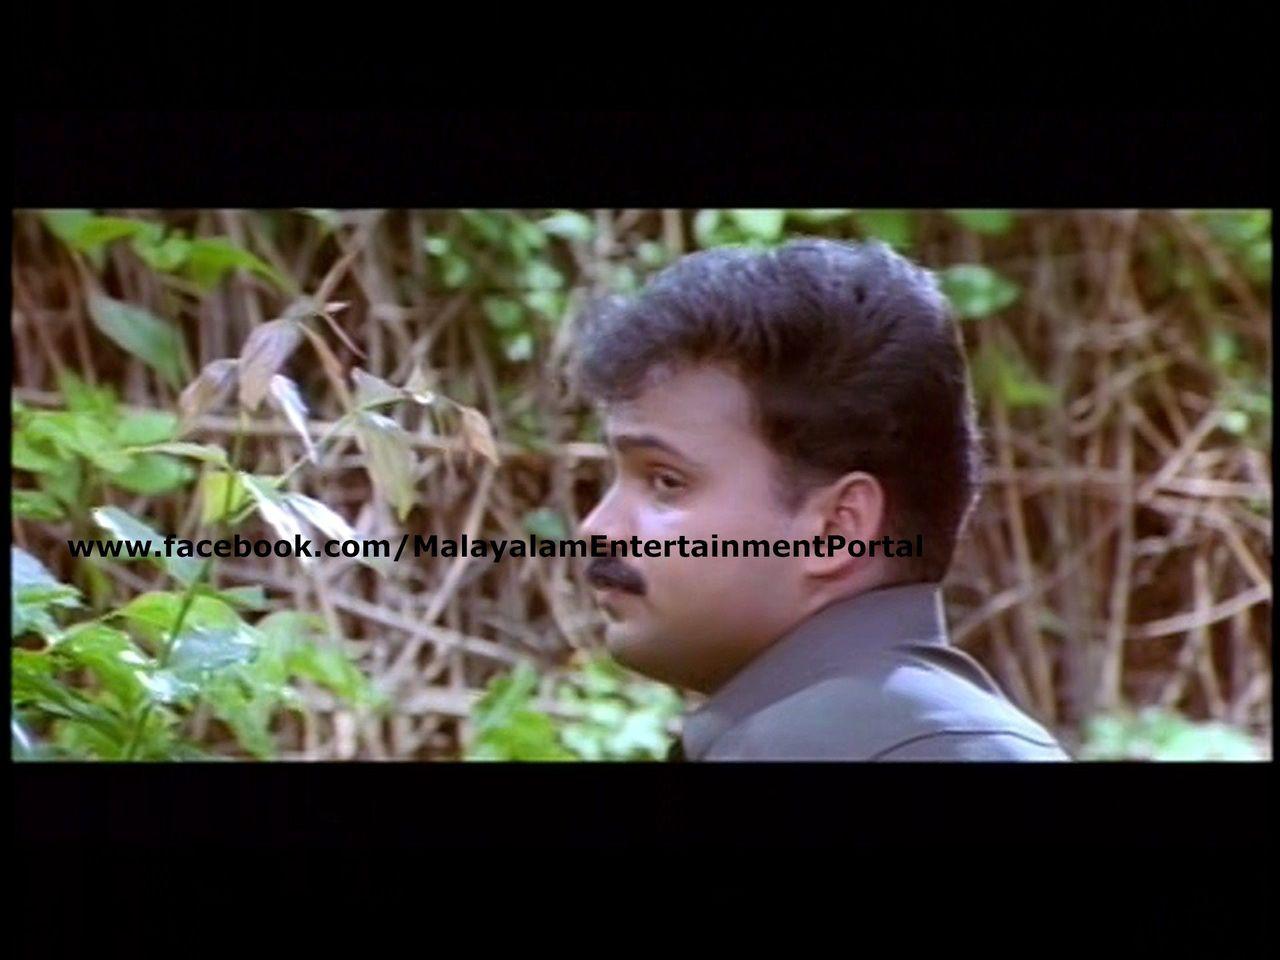 Narendran Makan Jayakanthan Vaka DVD Screenshots (Saina) Bscap0005